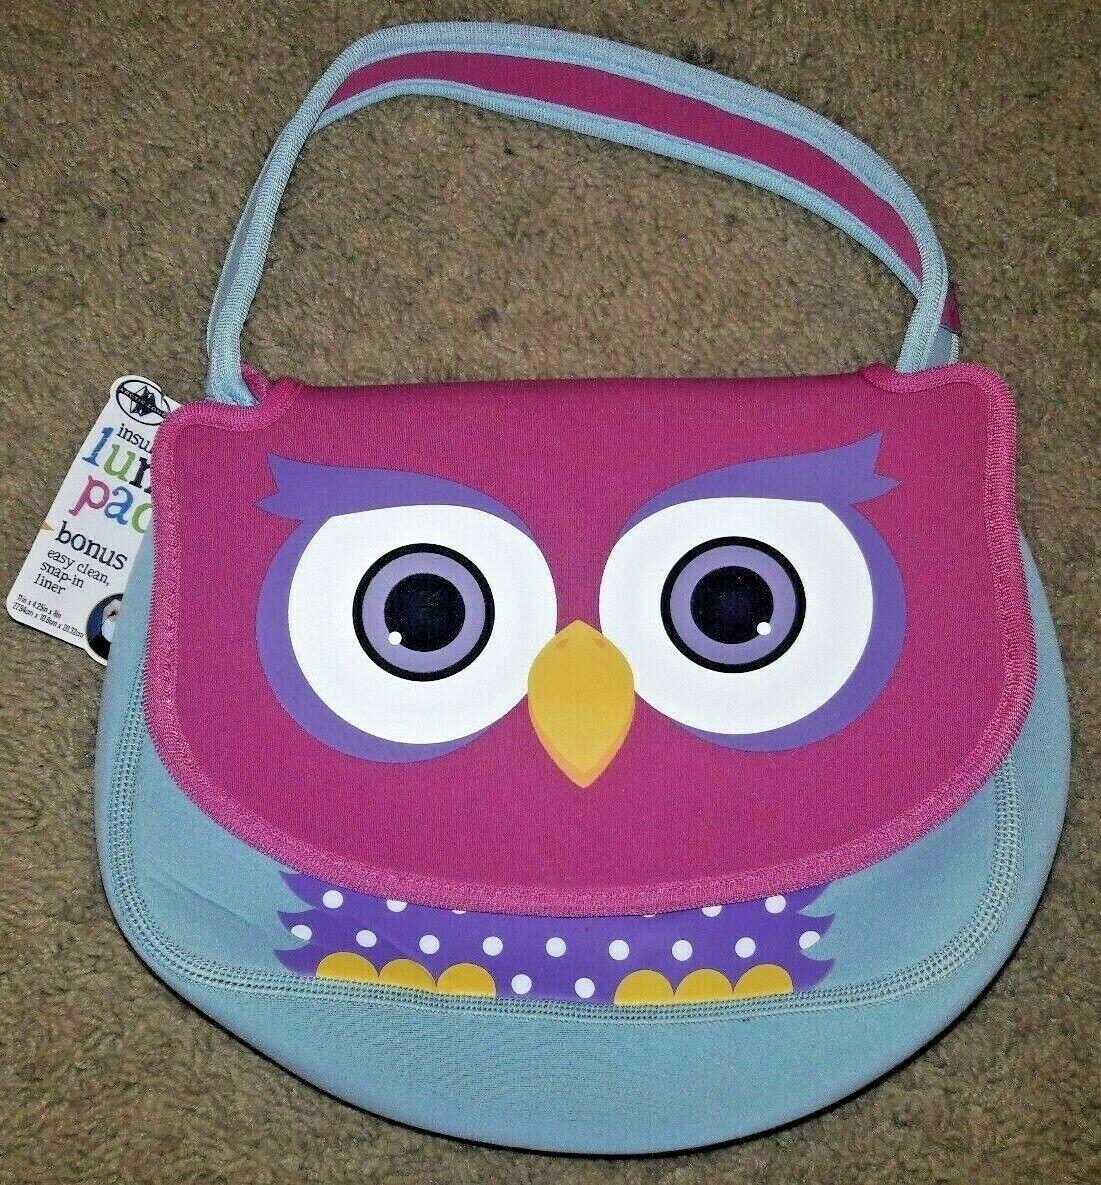 🥘🍕 Arctic Zone OWL Insulated Lunch Box Pack Neoprene N